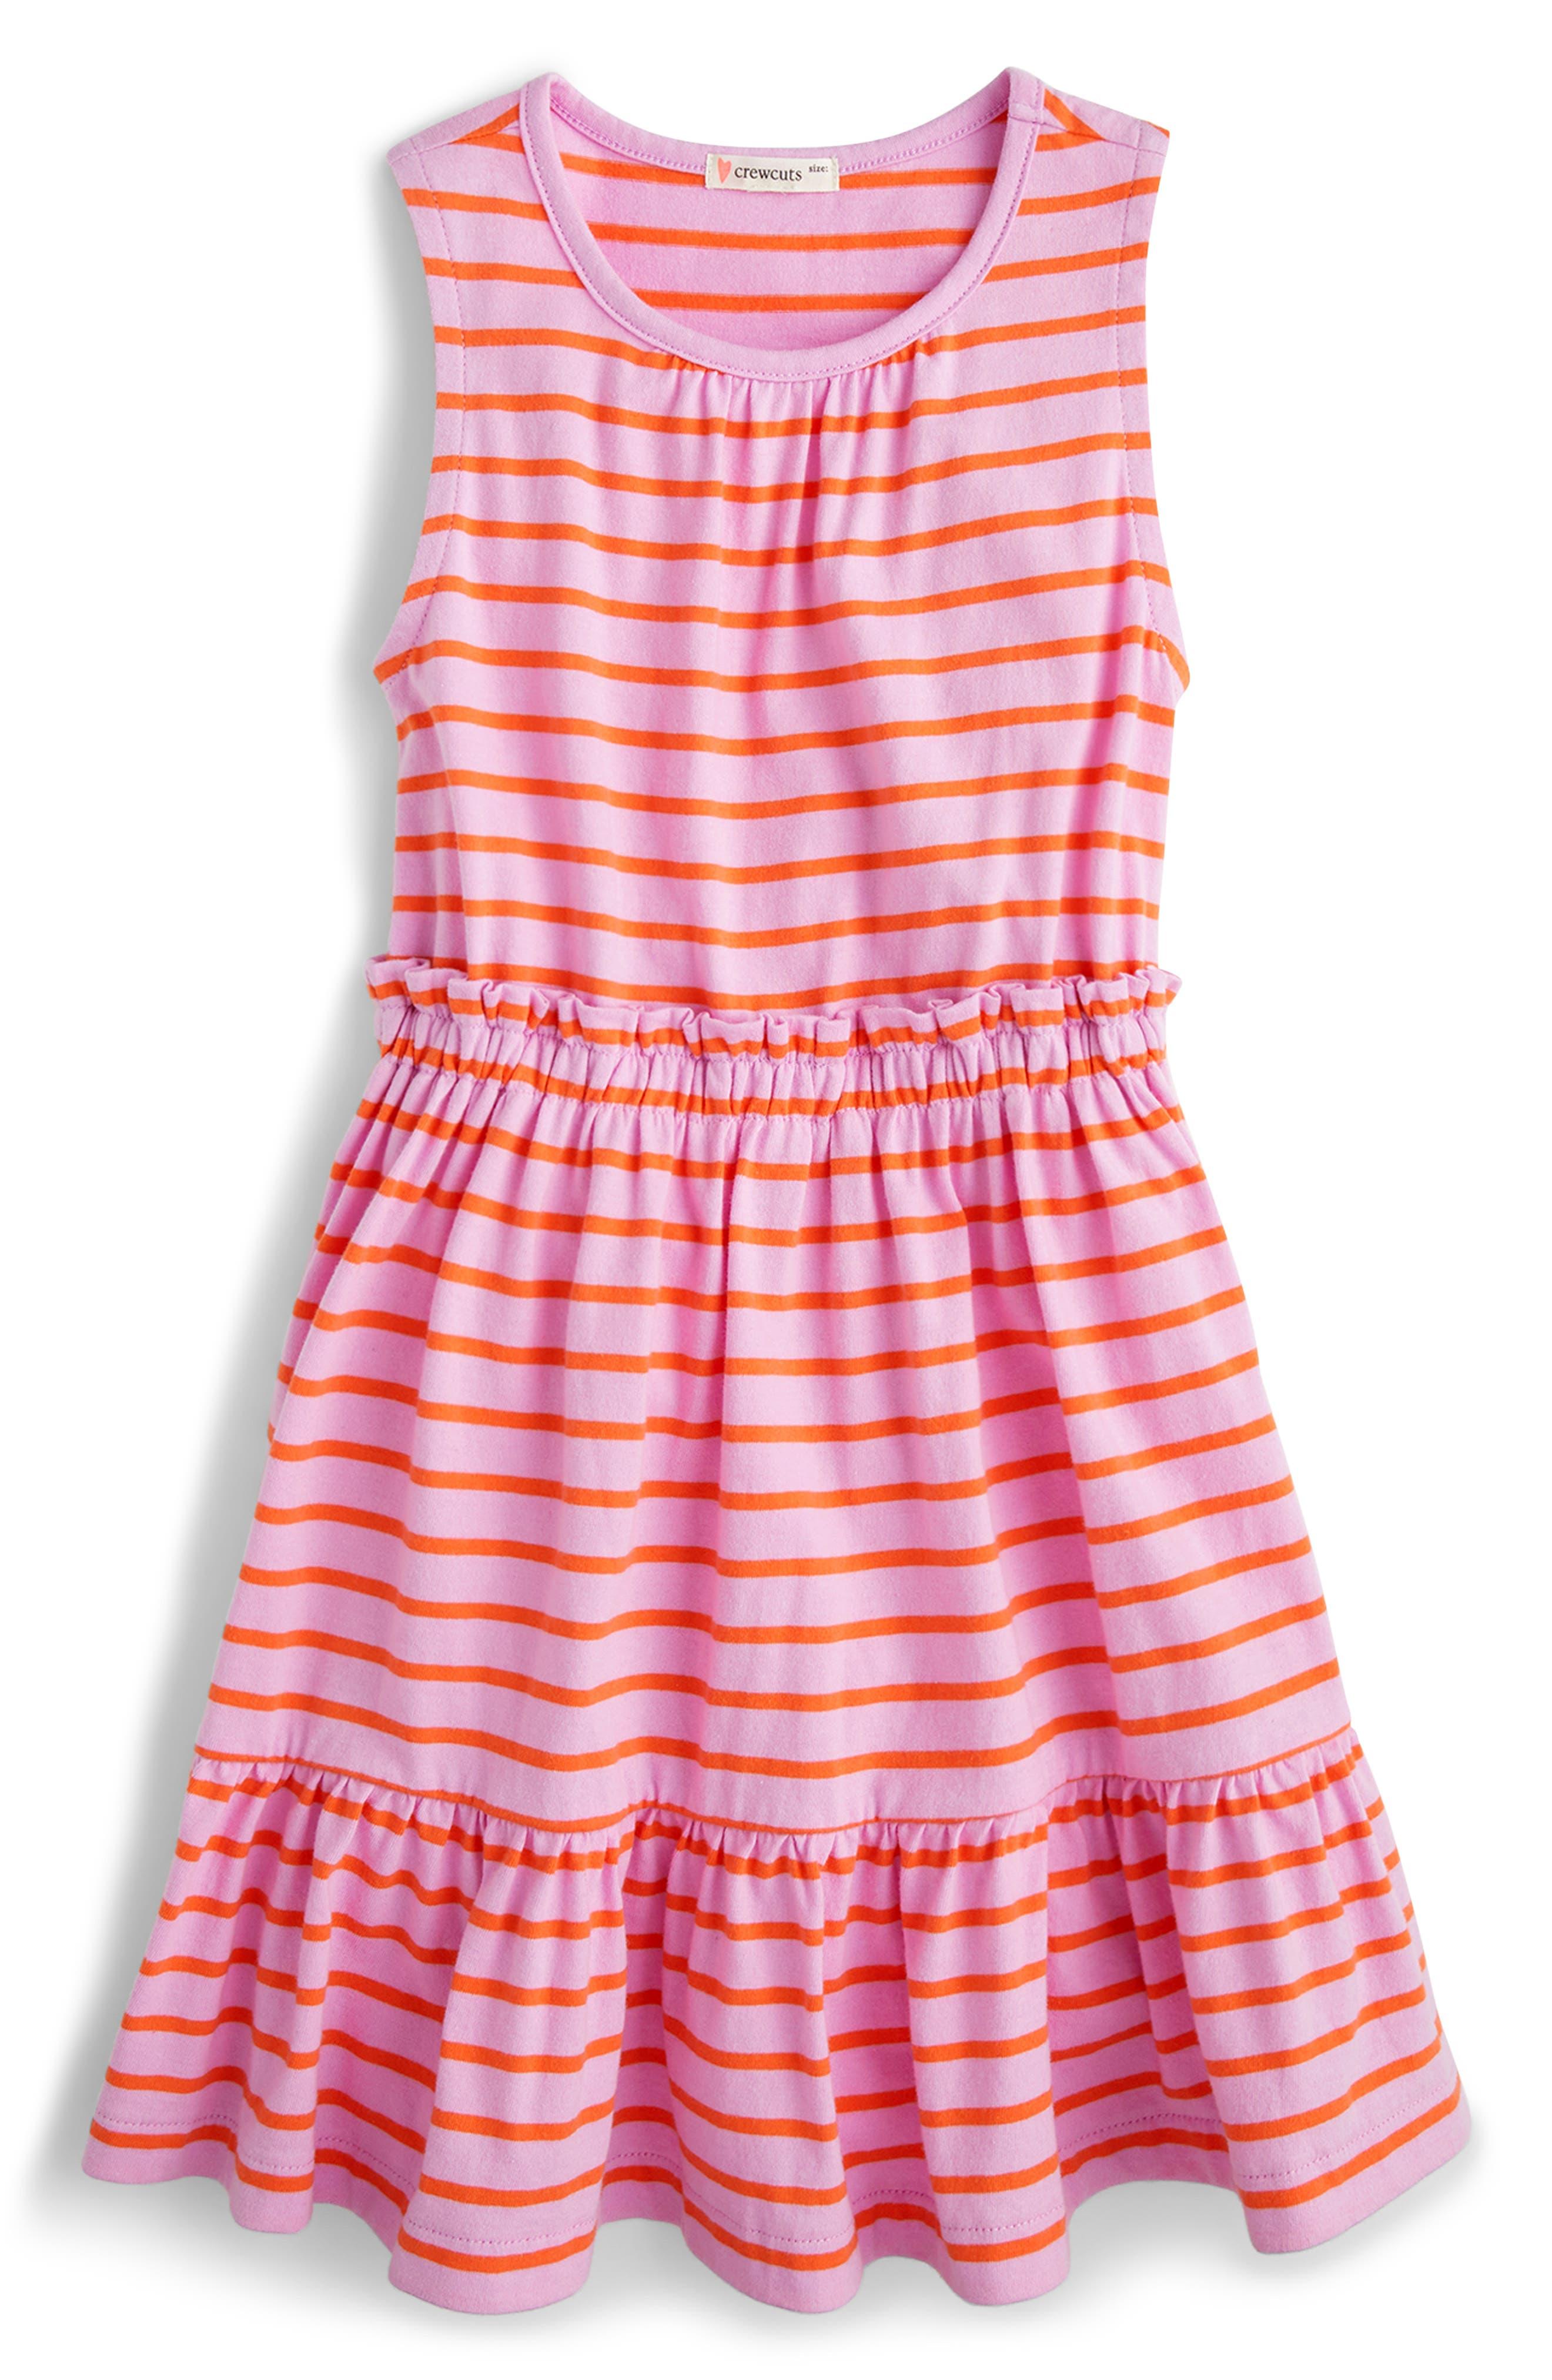 Toddler Girls Crewcuts By Jcrew Sleeveless Ruffle Dress Size 3T  White